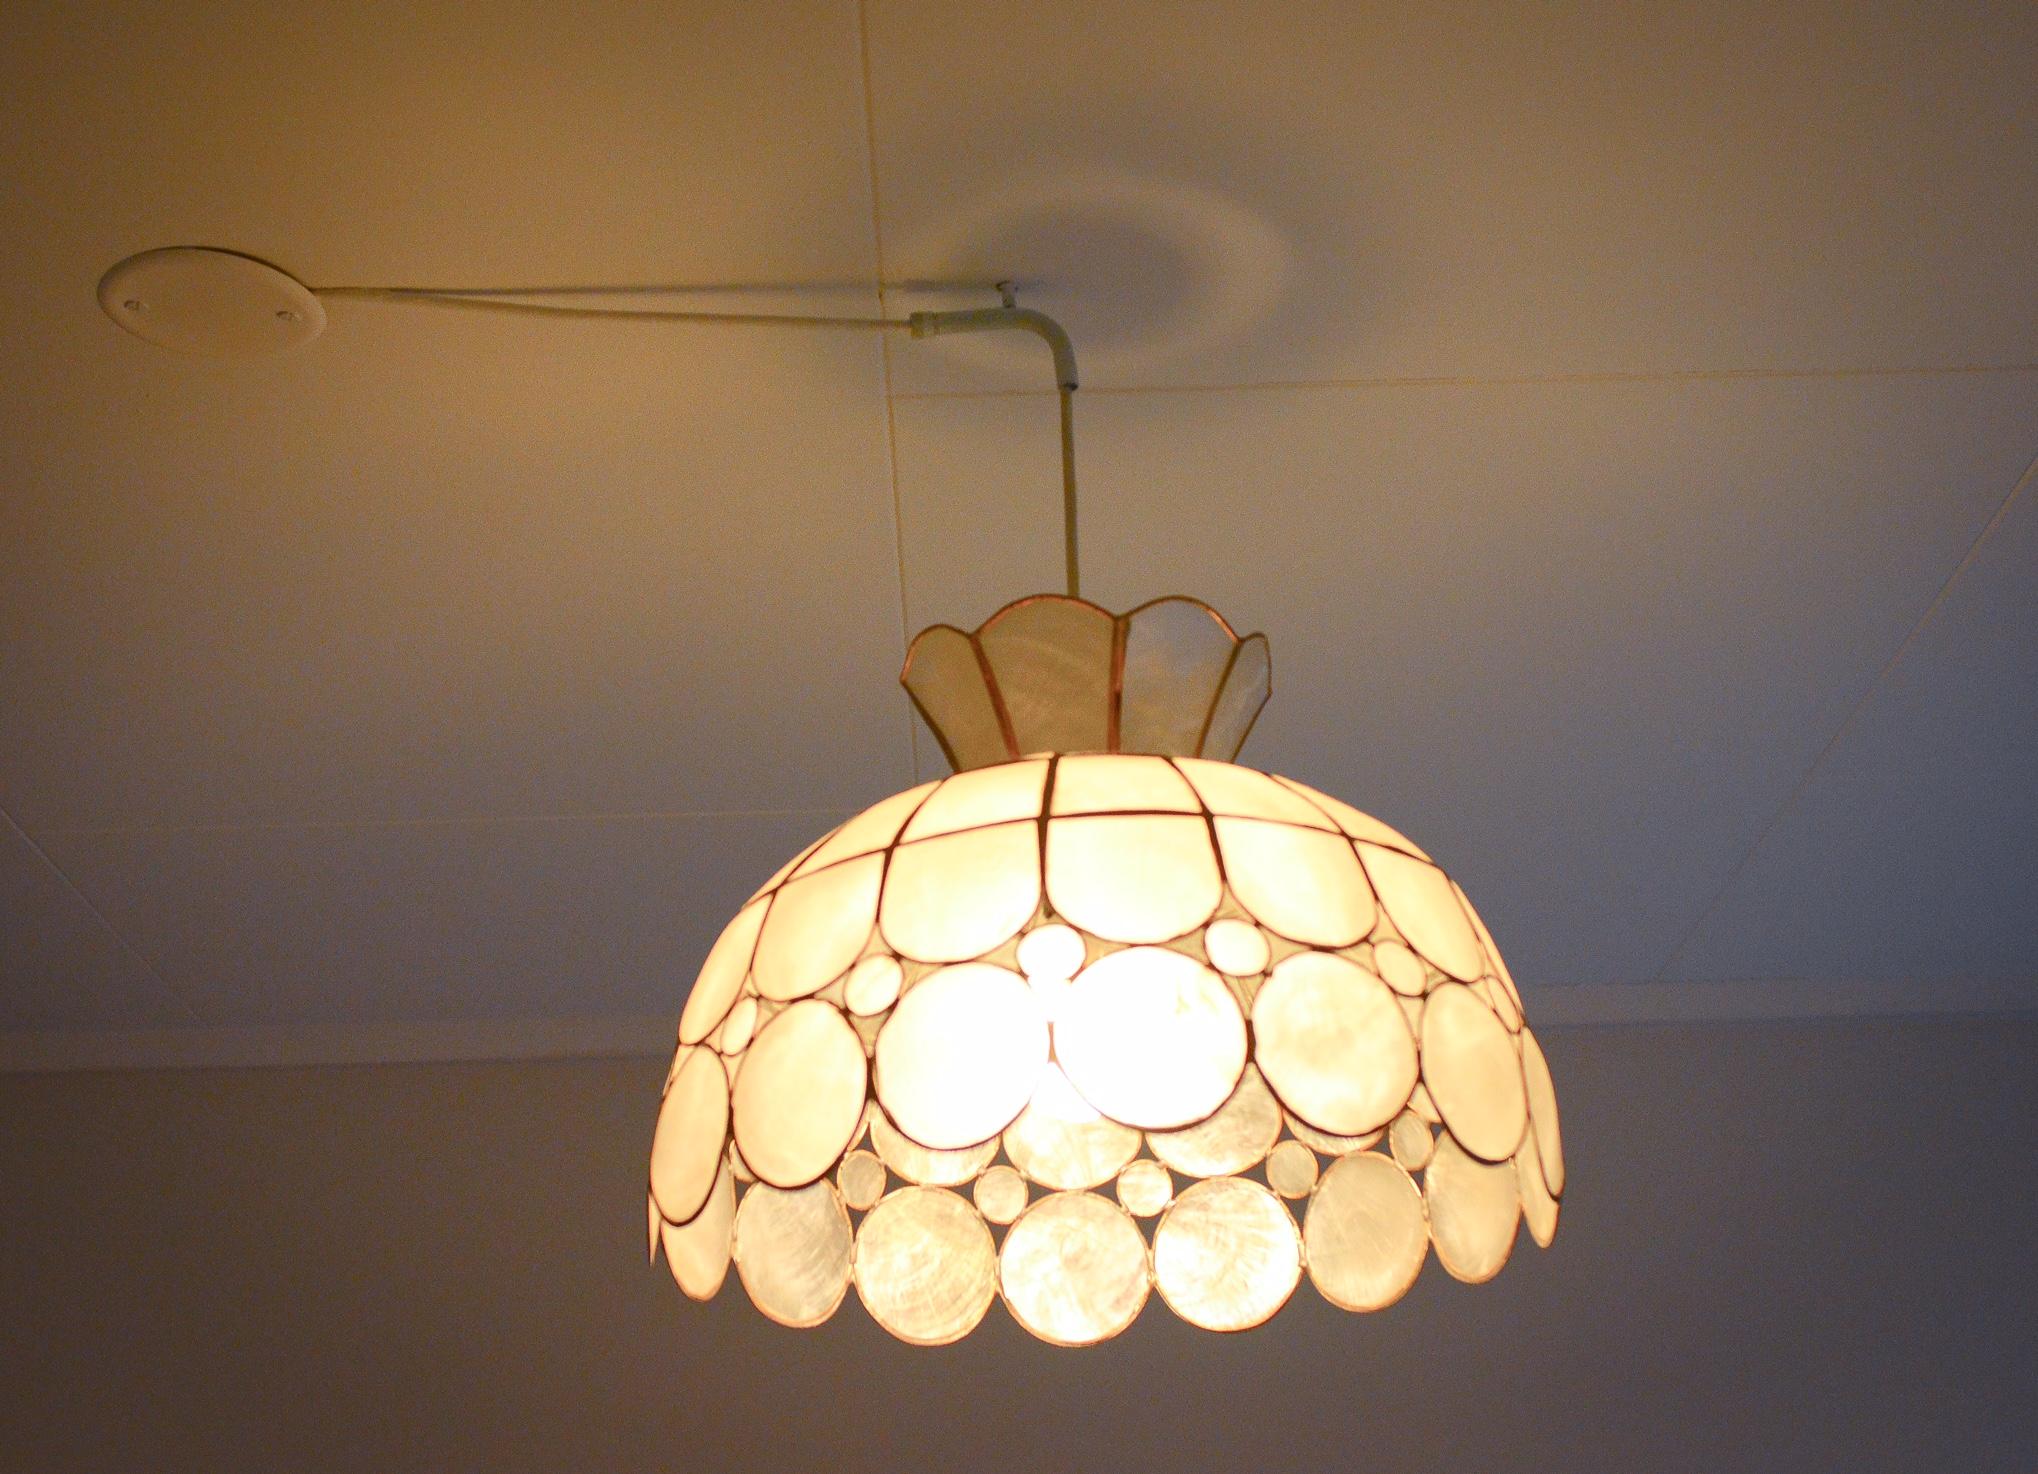 montere lampe i taket